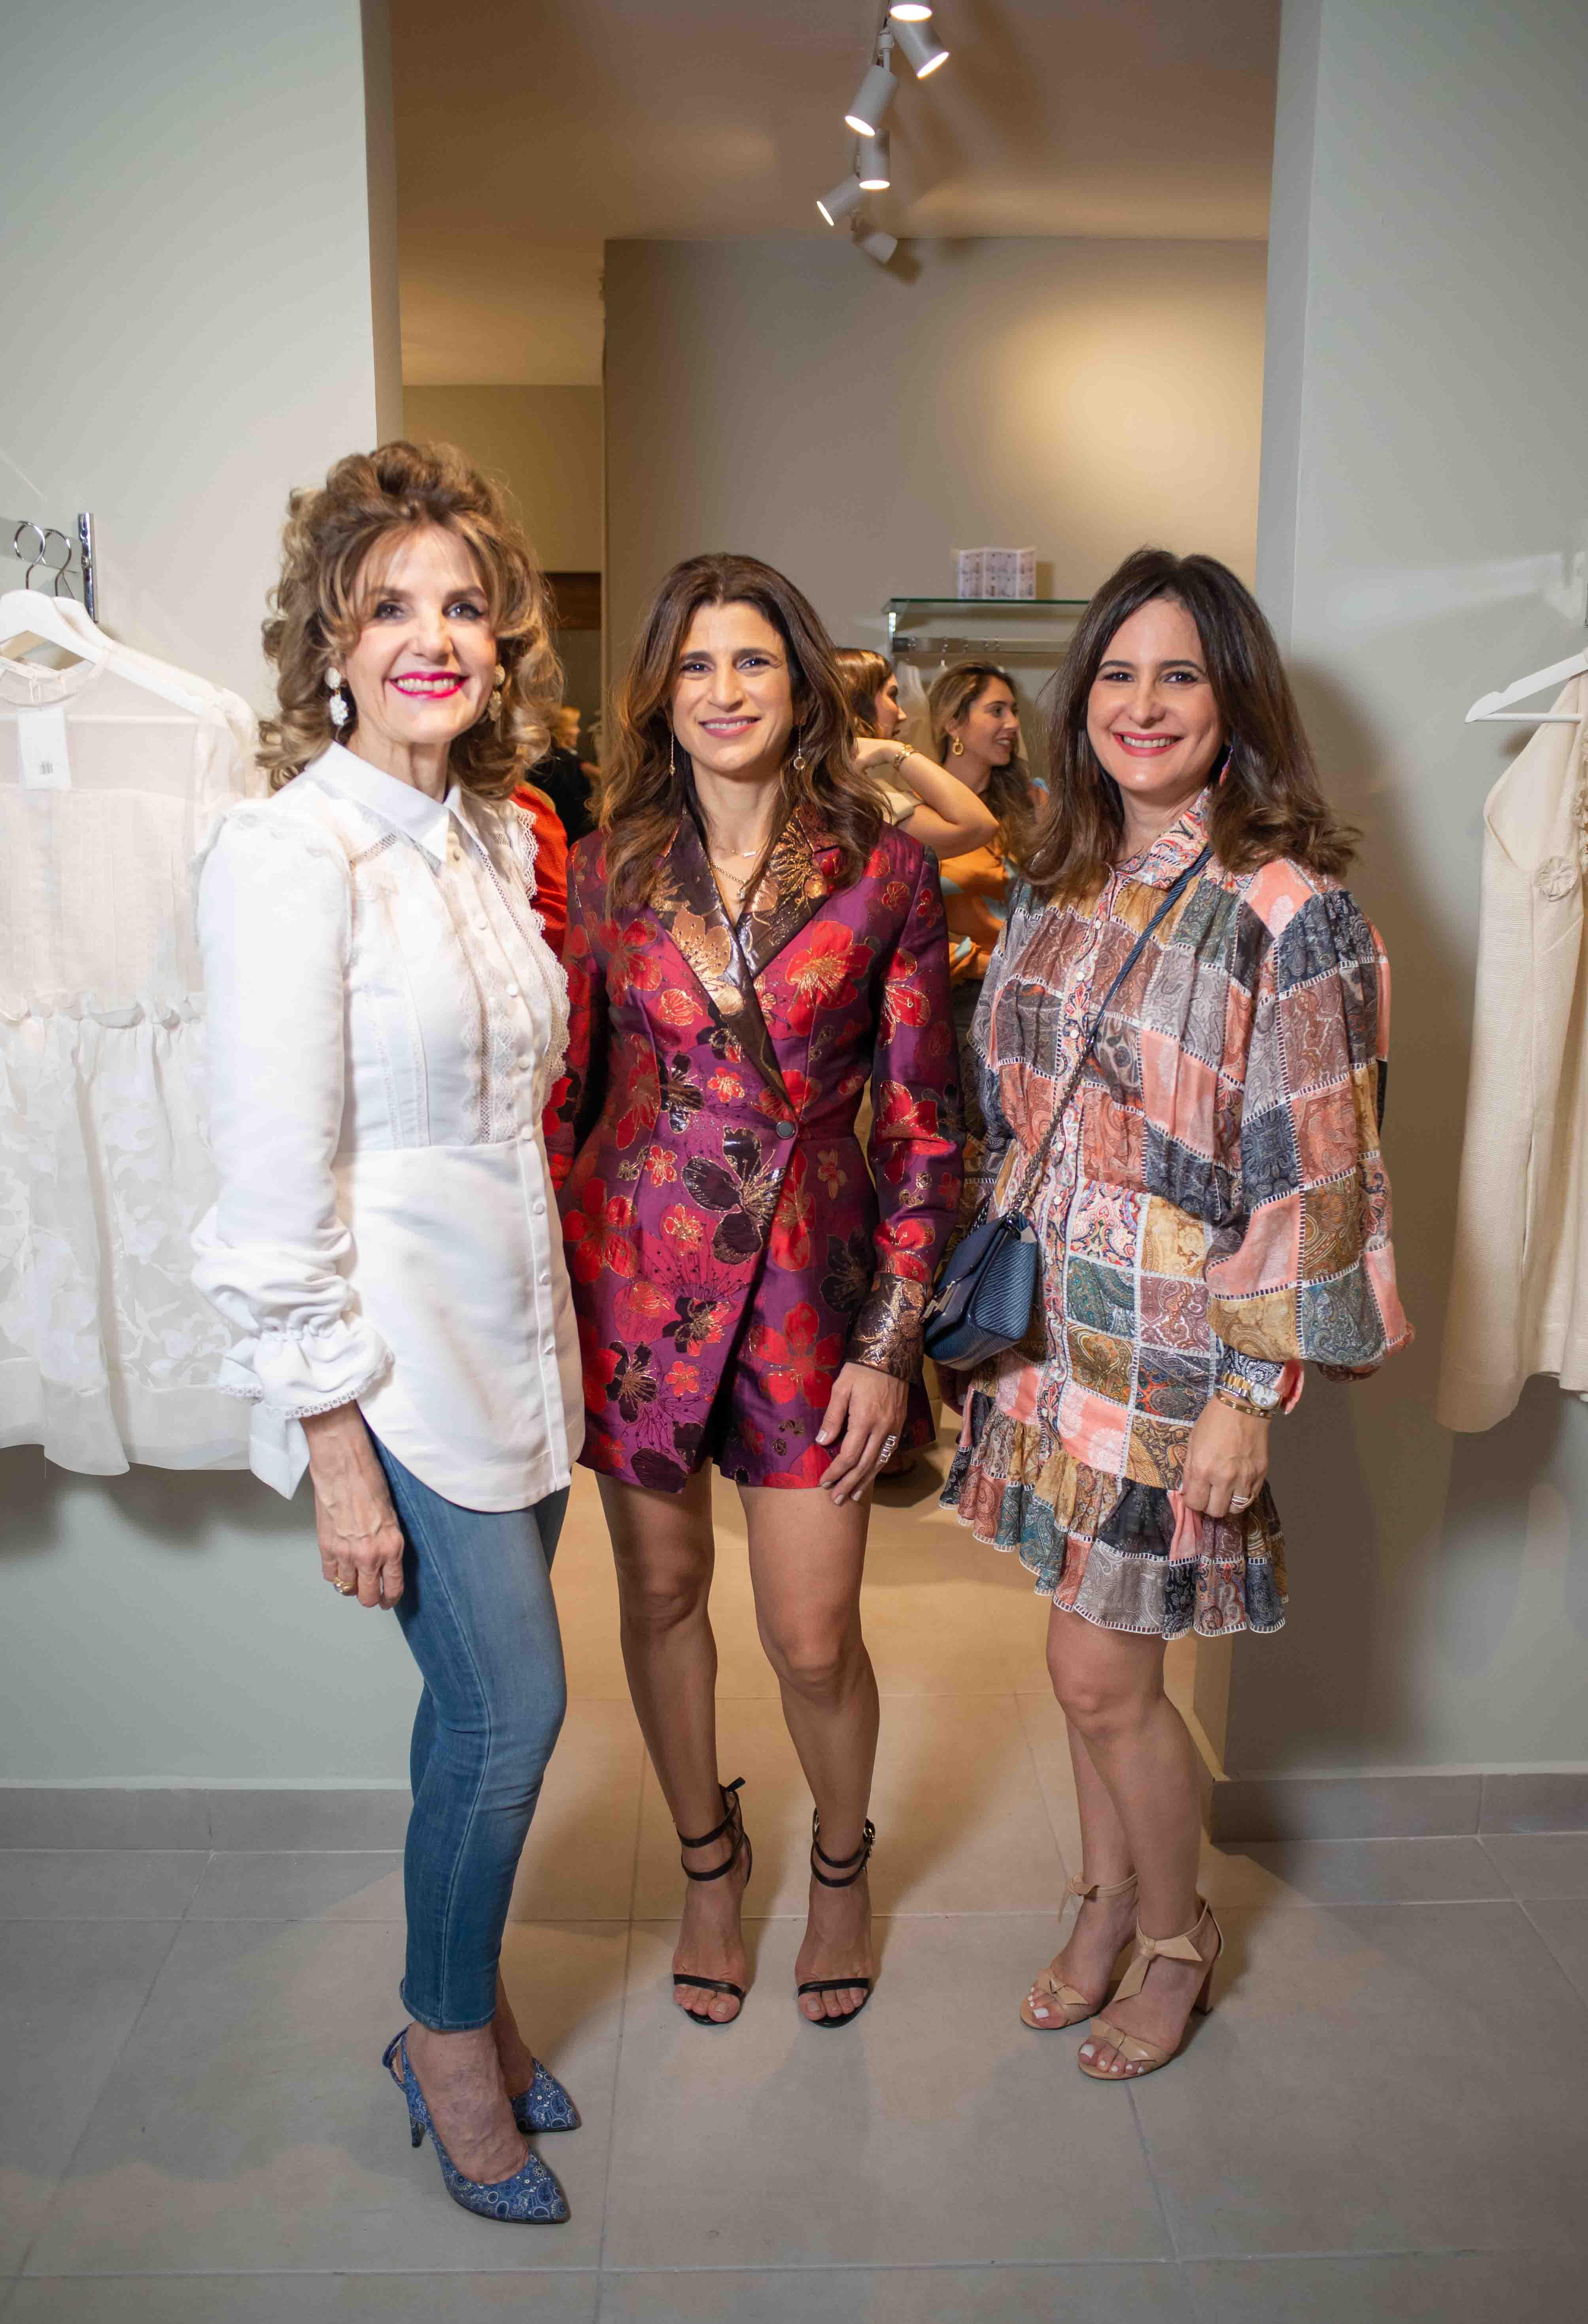 2.Carmen Vincen, Roxanna Rizek & Bethania Guerro